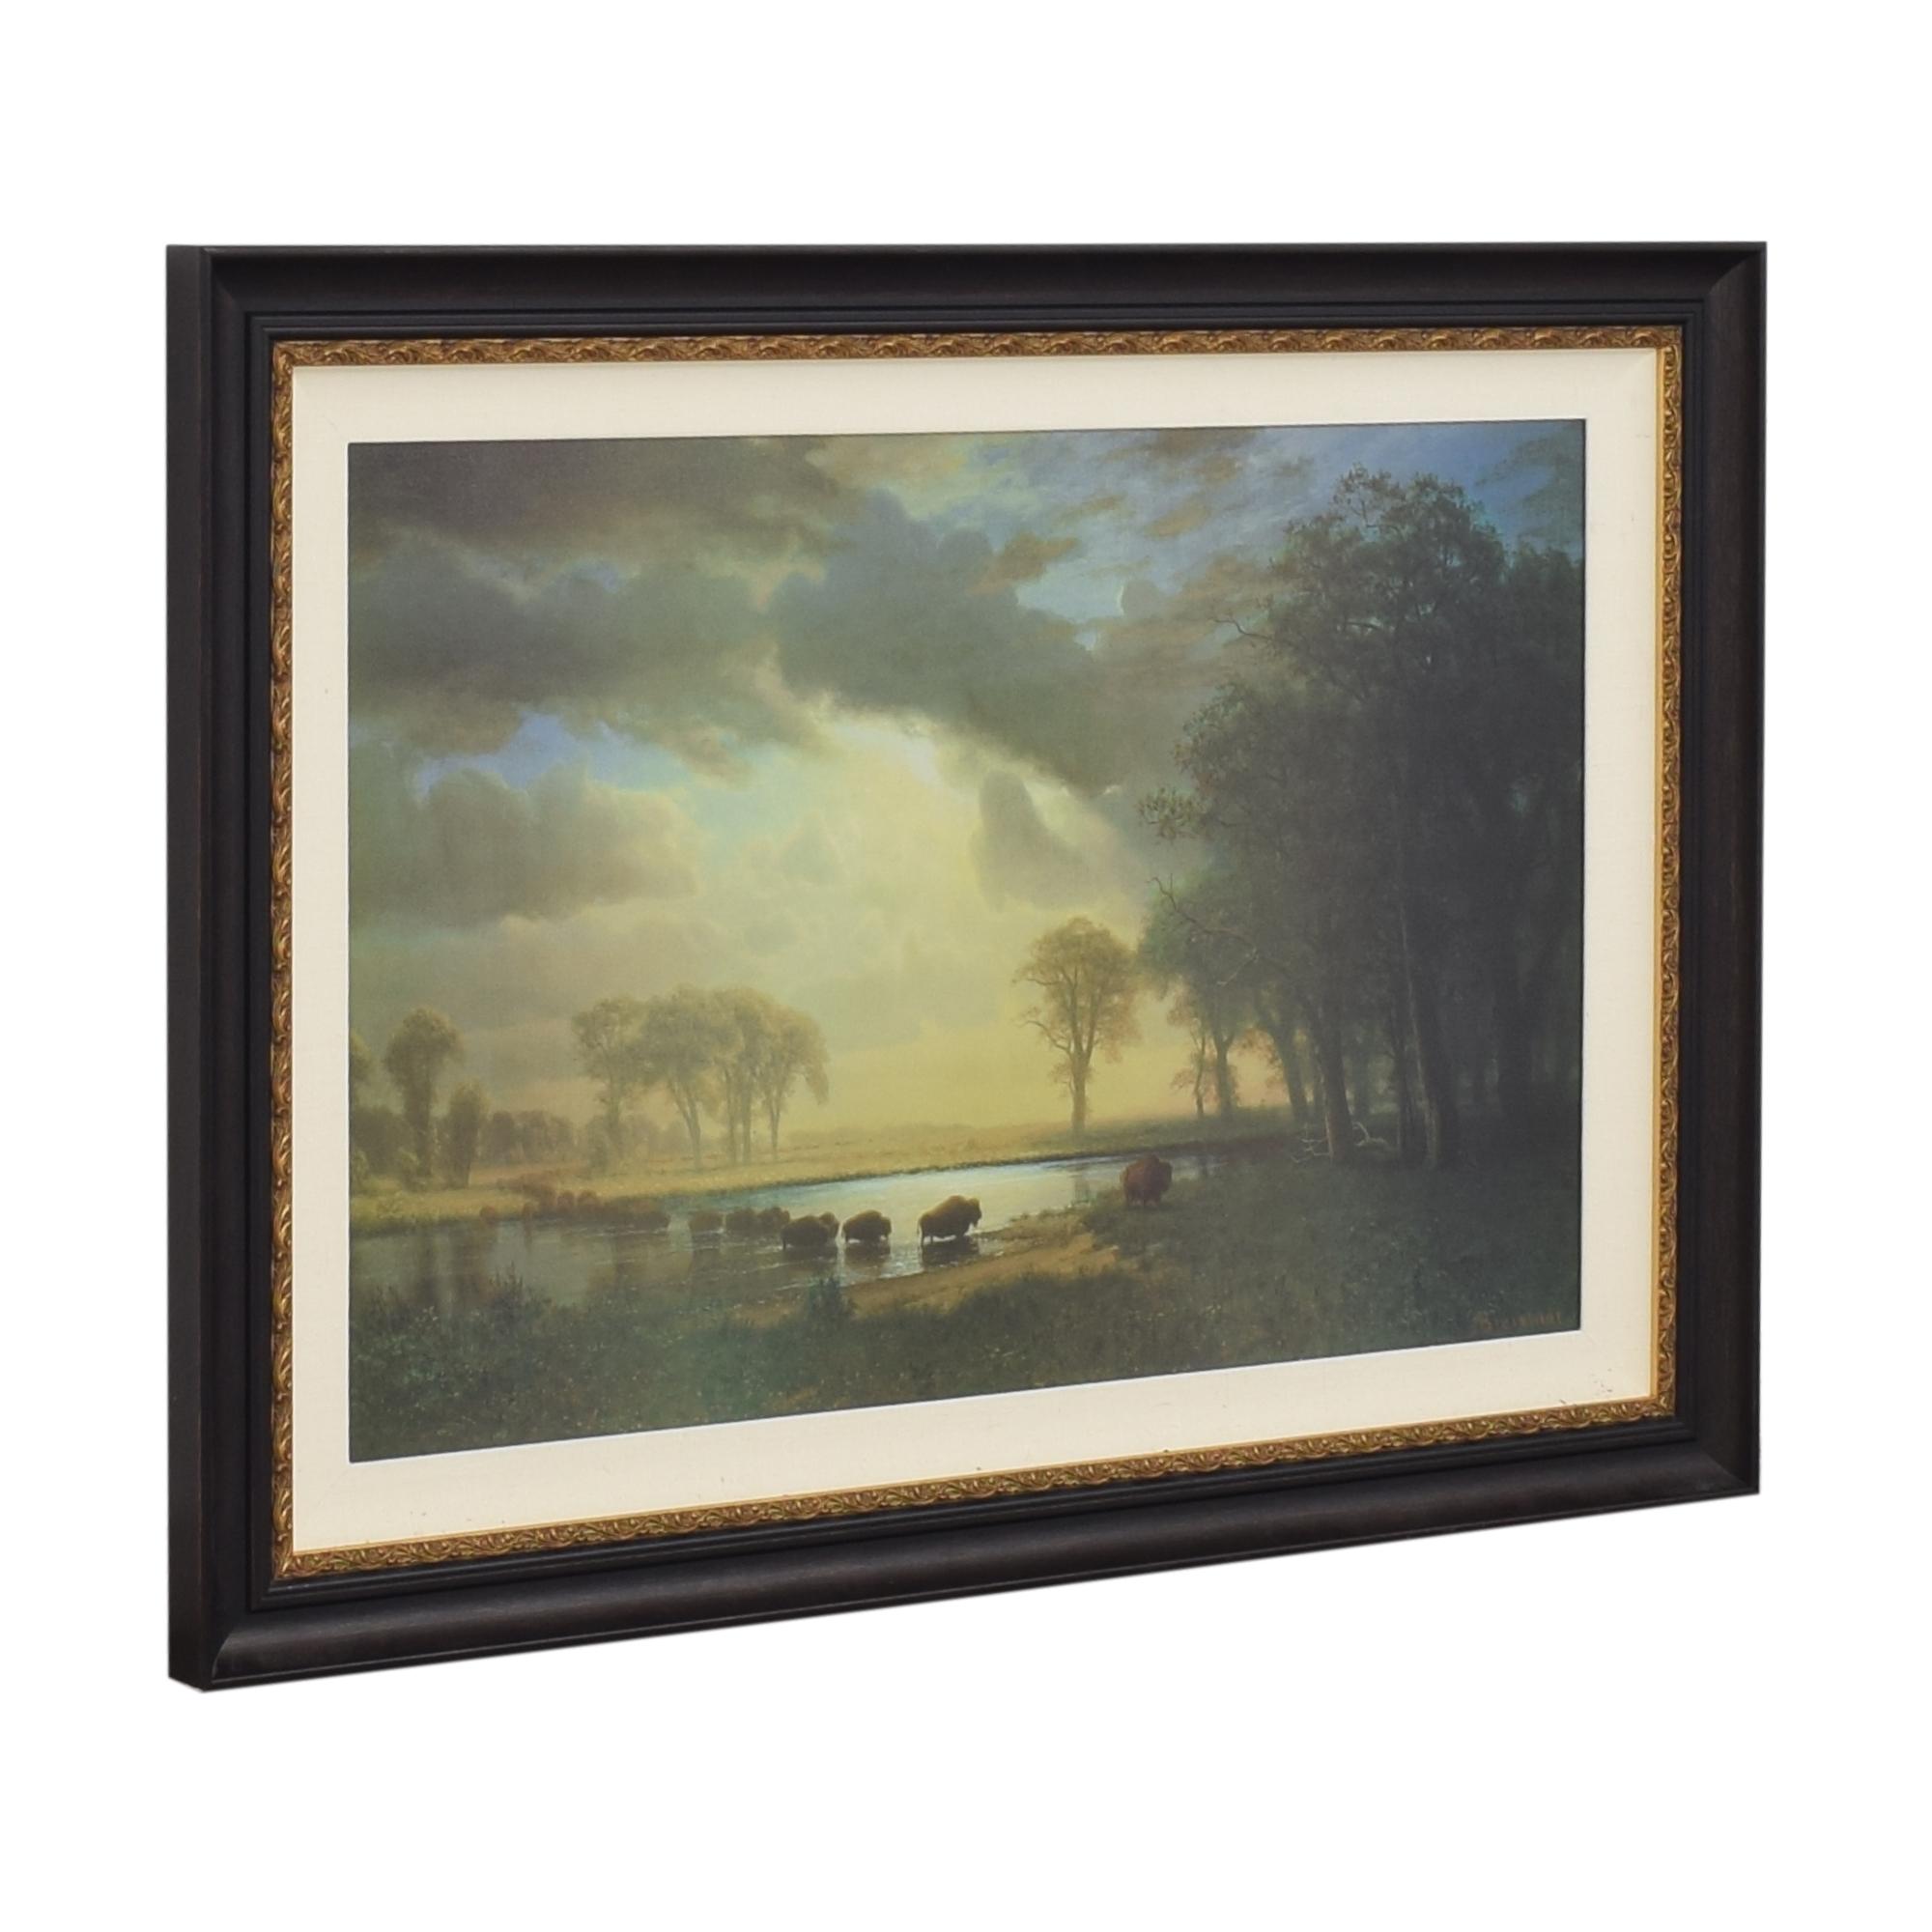 The Buffalo Trail by Albert Bierstadt Framed Wall Art price